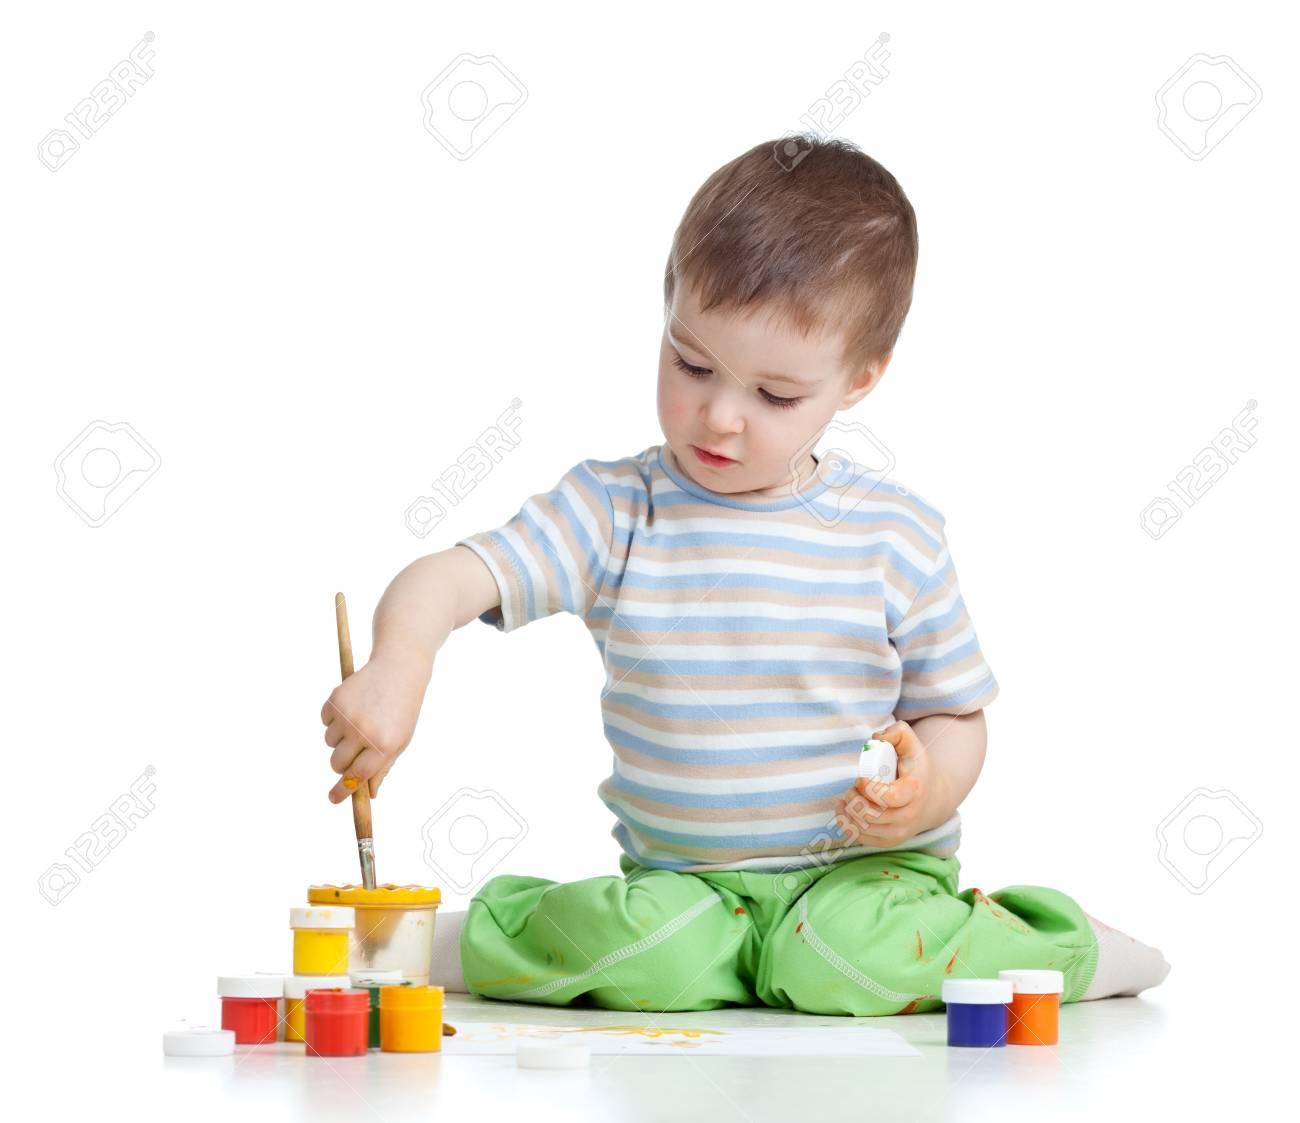 painting child boy over white background Stock Photo - 14824285